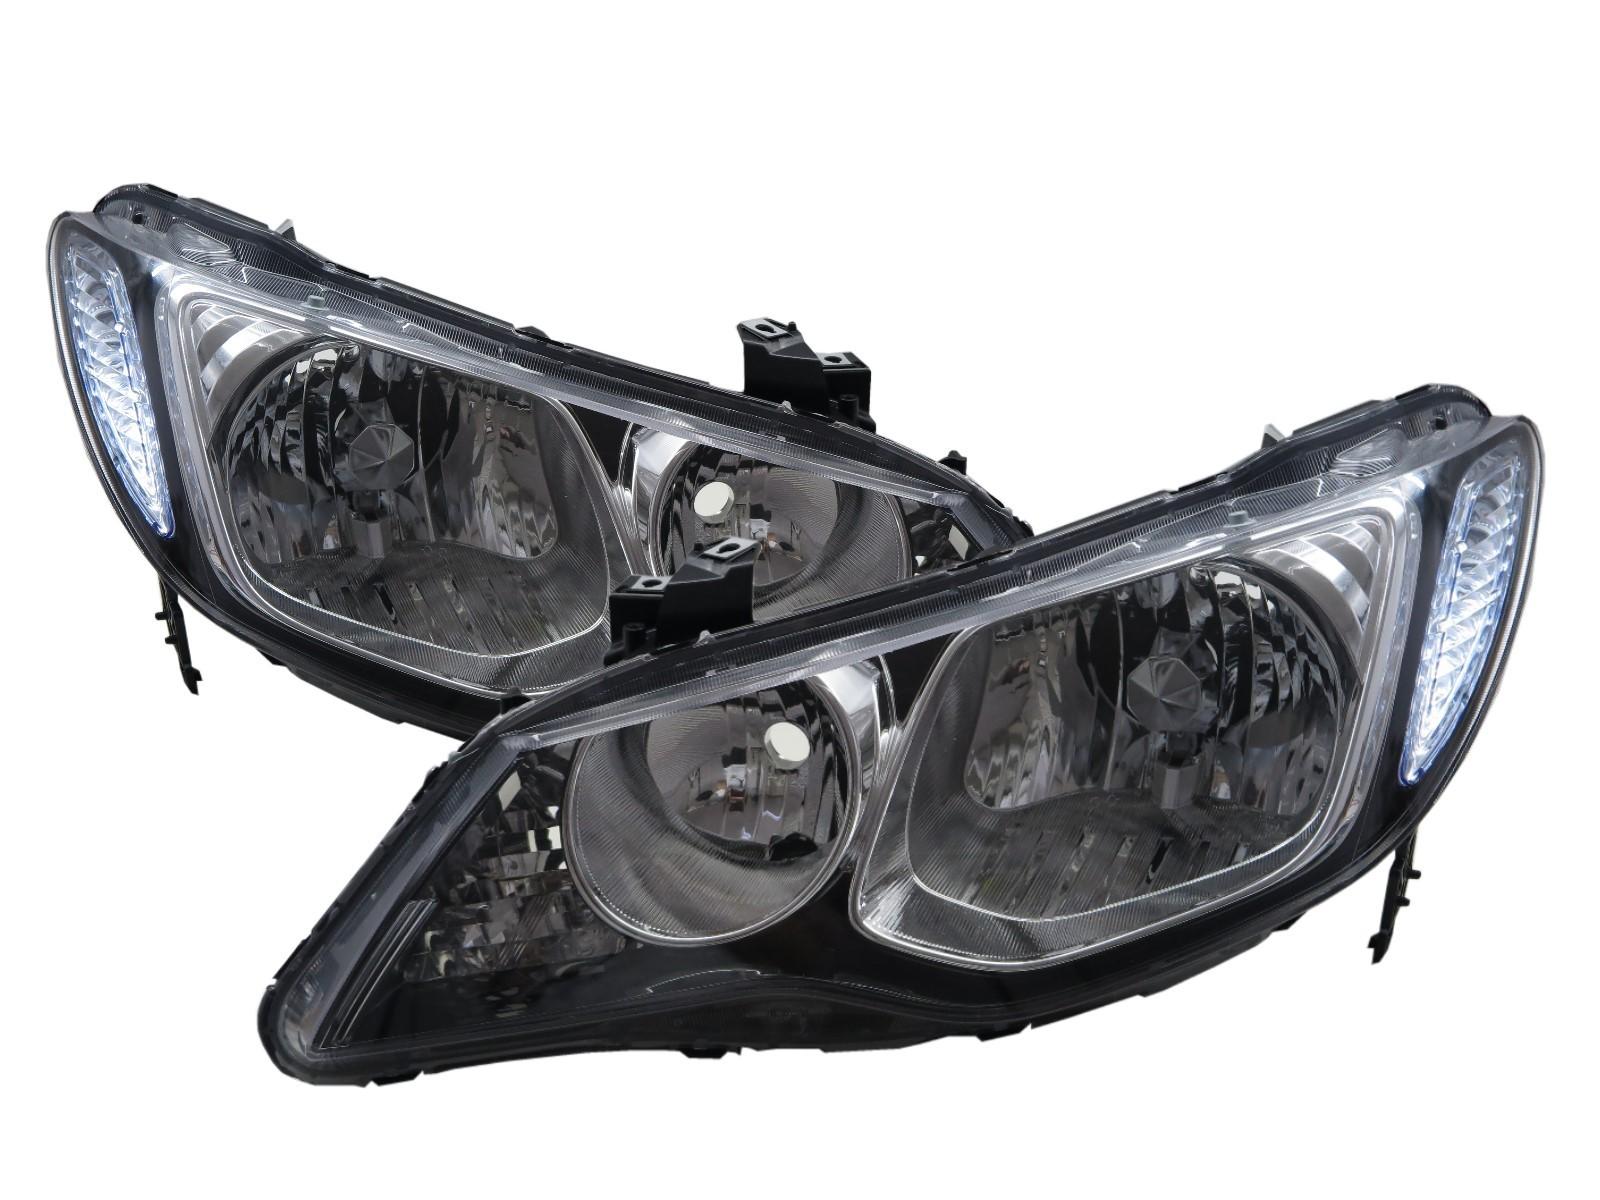 CrazyTheGod Ciimo 2012-2016 Sedan 4D Clear Headlight Headlamp Black for Dongfeng LHD